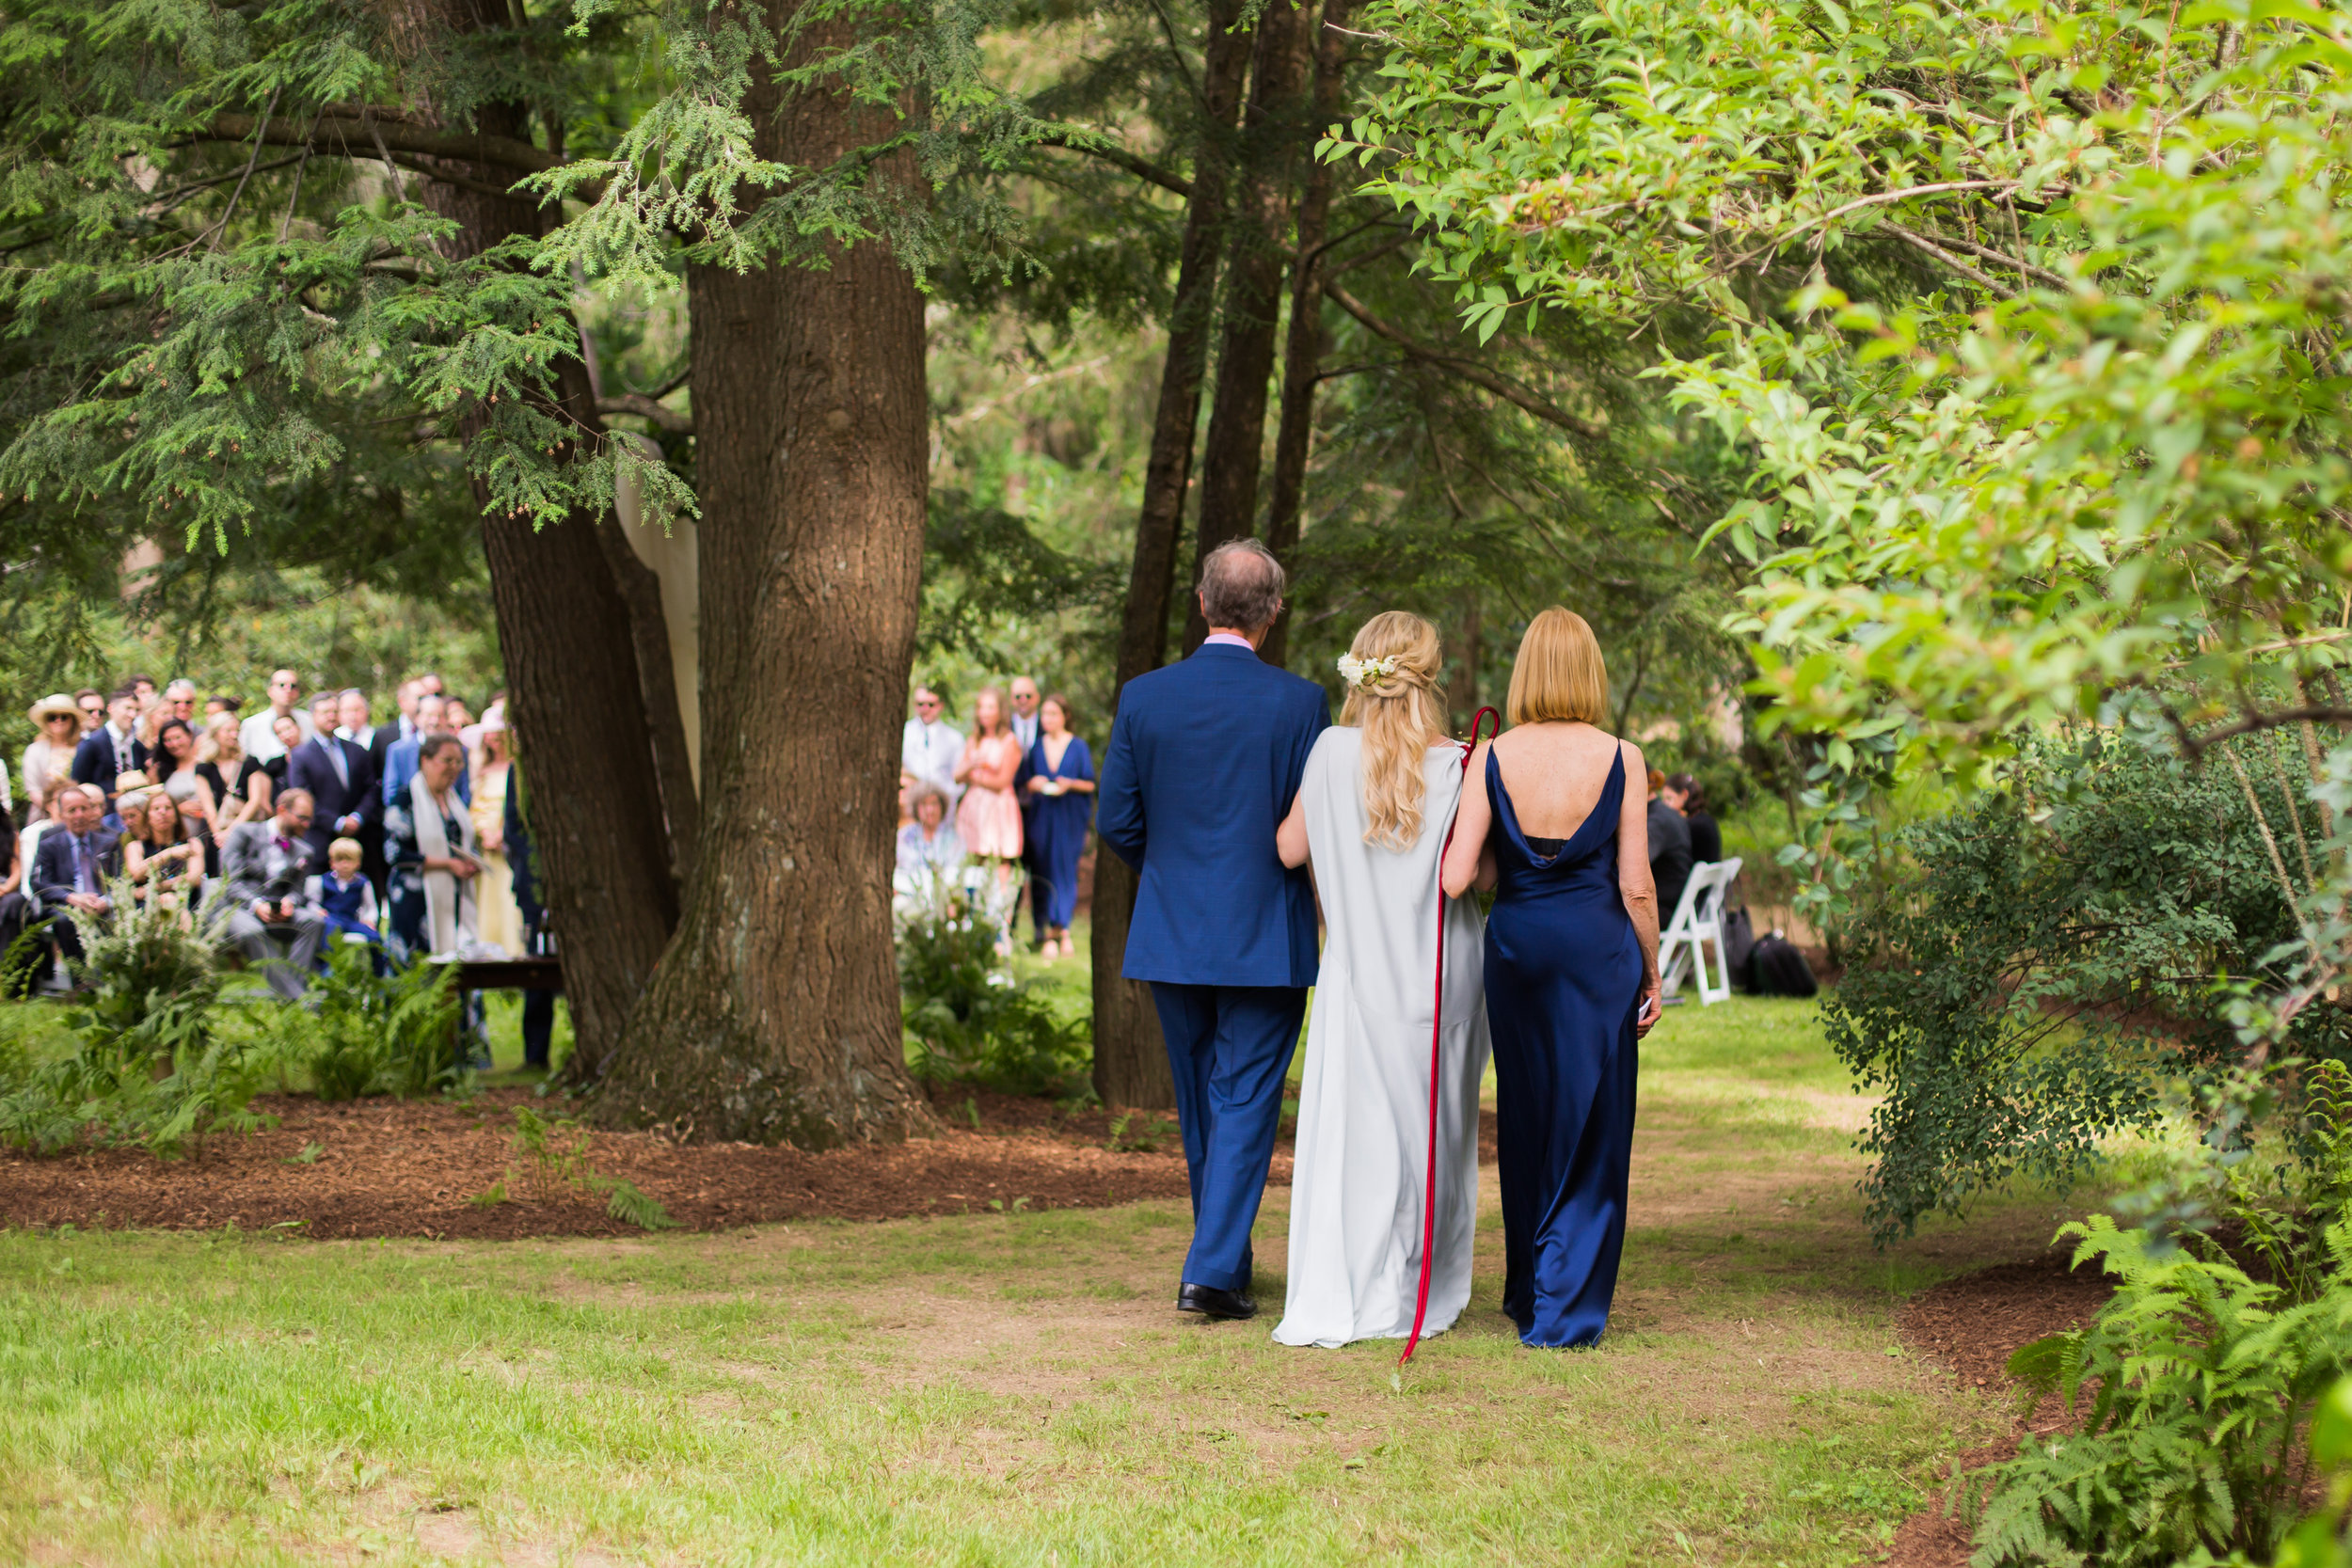 Julie-and-Peter-Wedding07212018-400.jpg